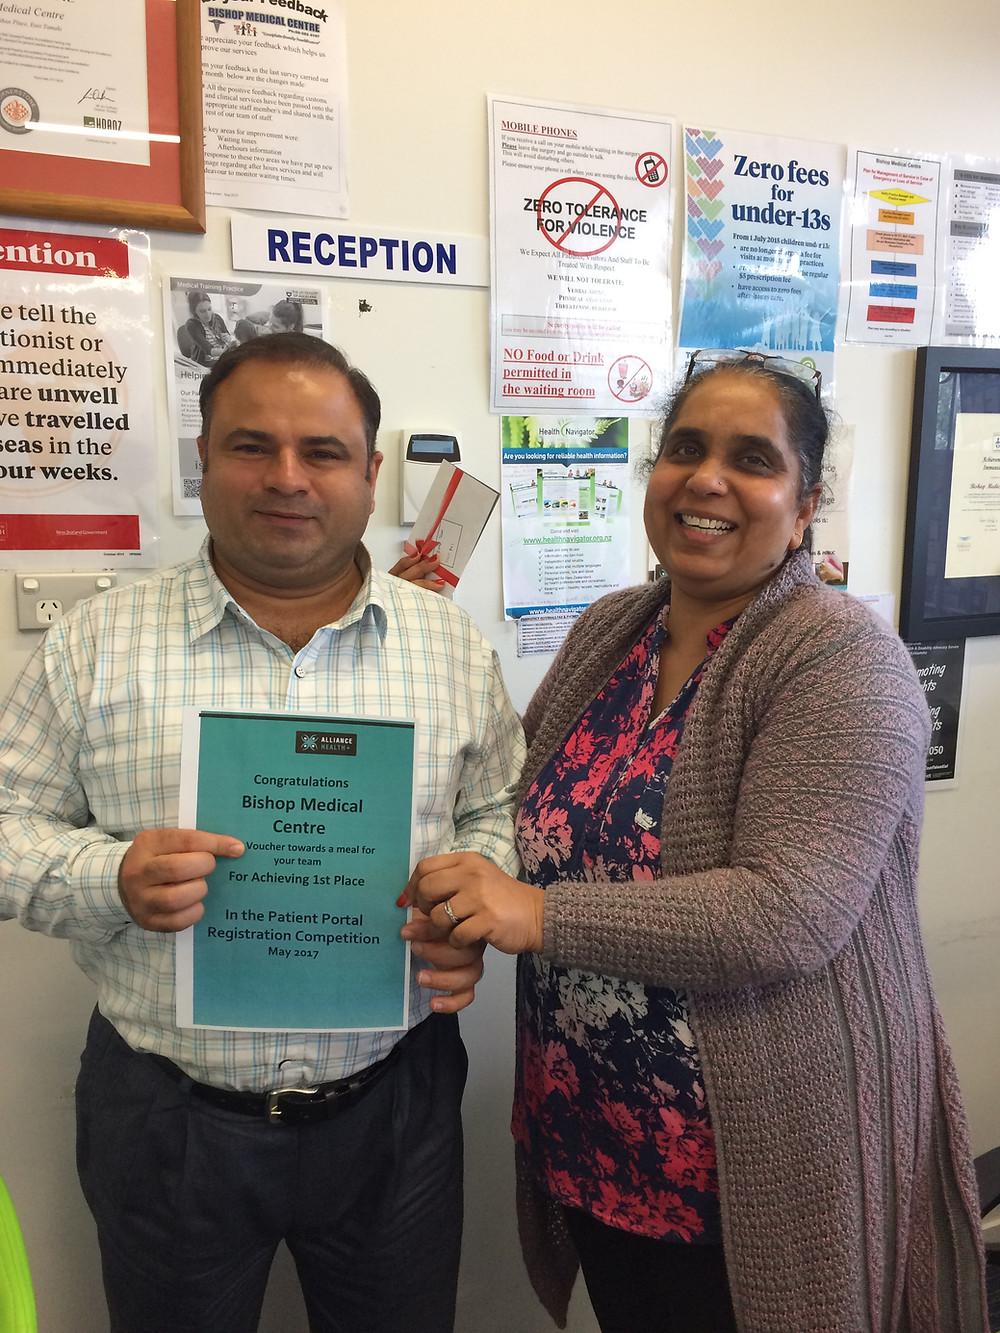 (Dr. Rajneesh Sharma & Sushma Sharma of Bishop Medical)